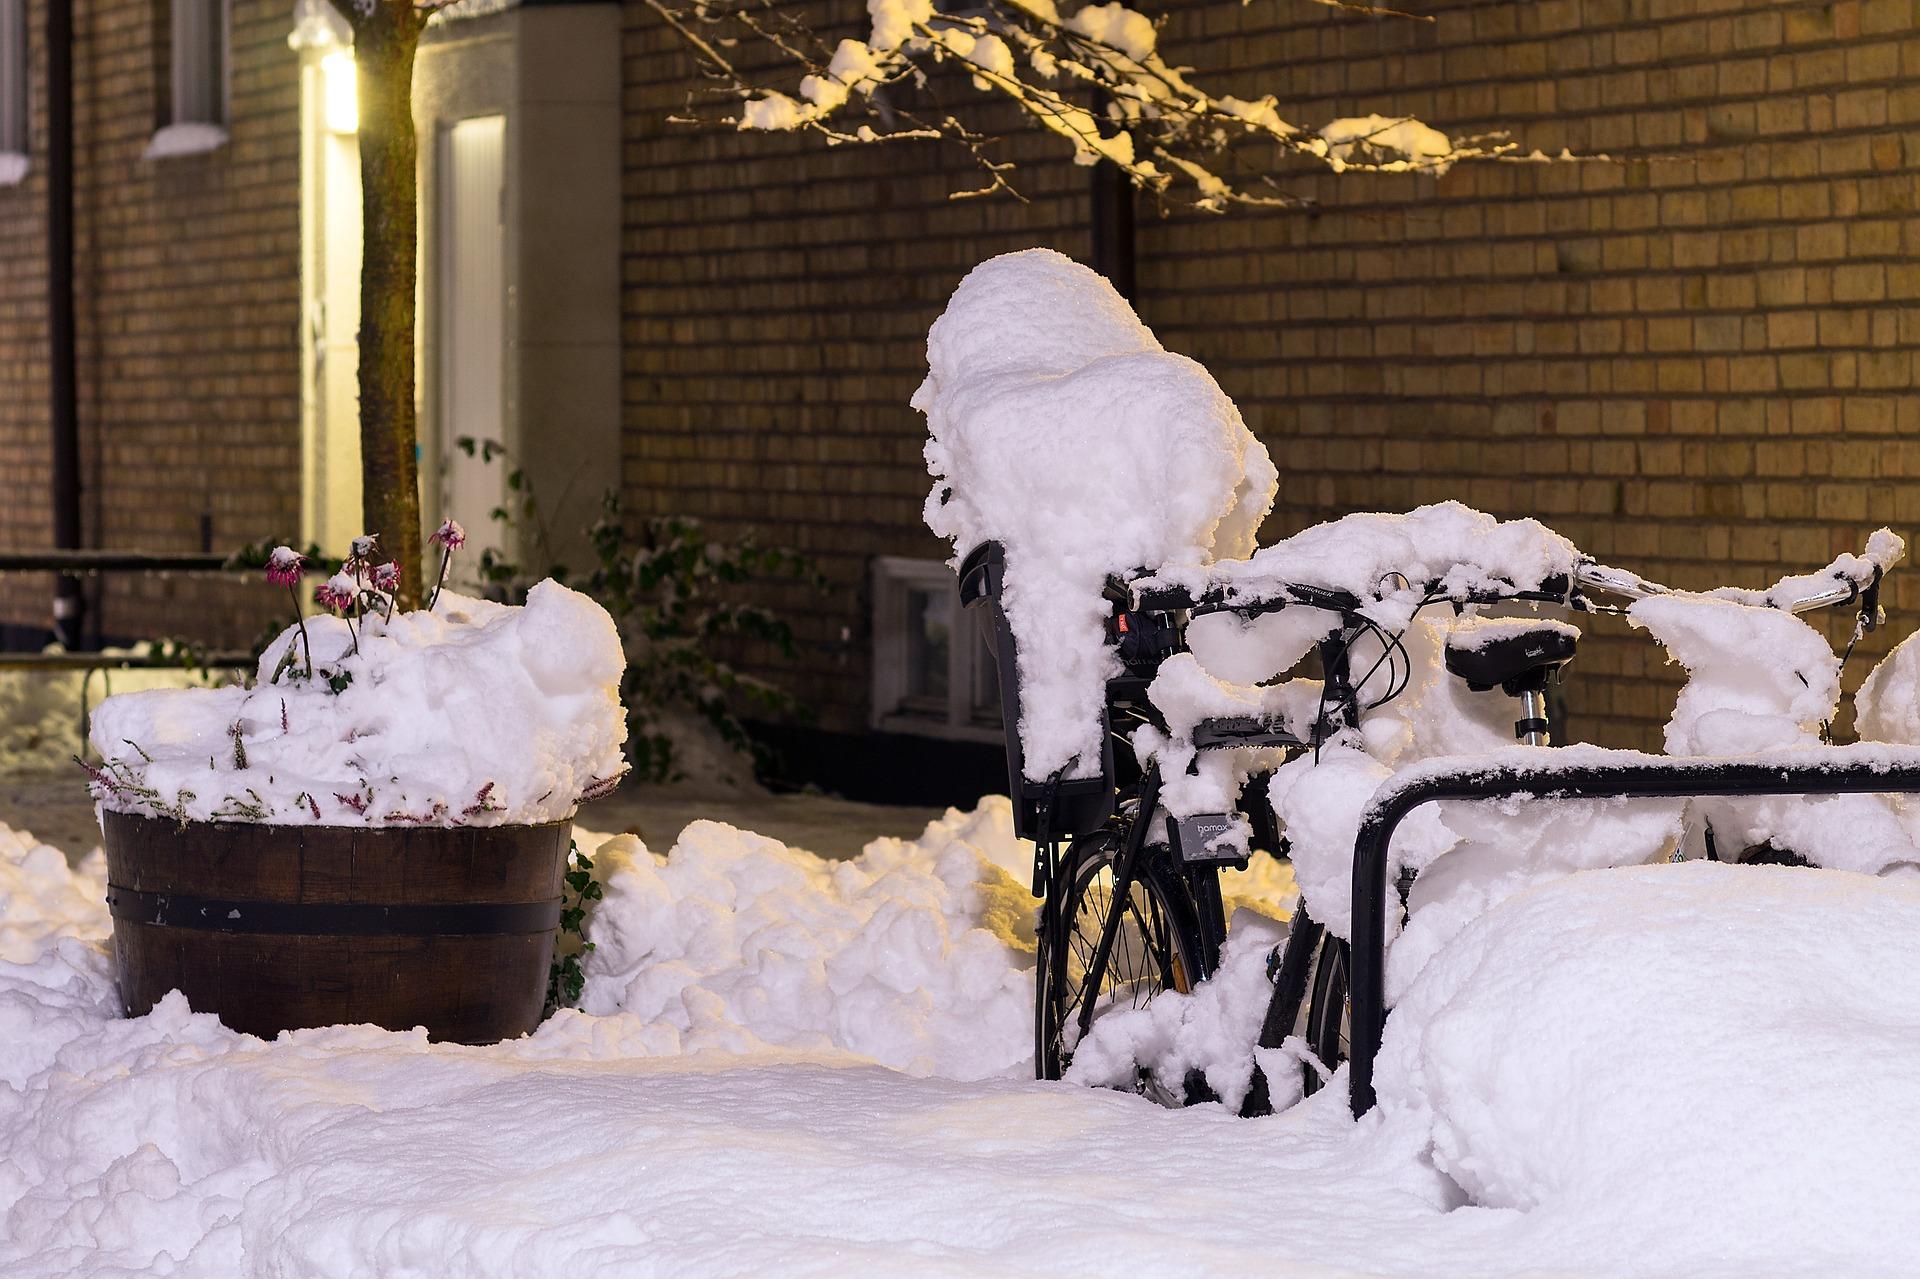 bicicleta iarna zapada deszapezire